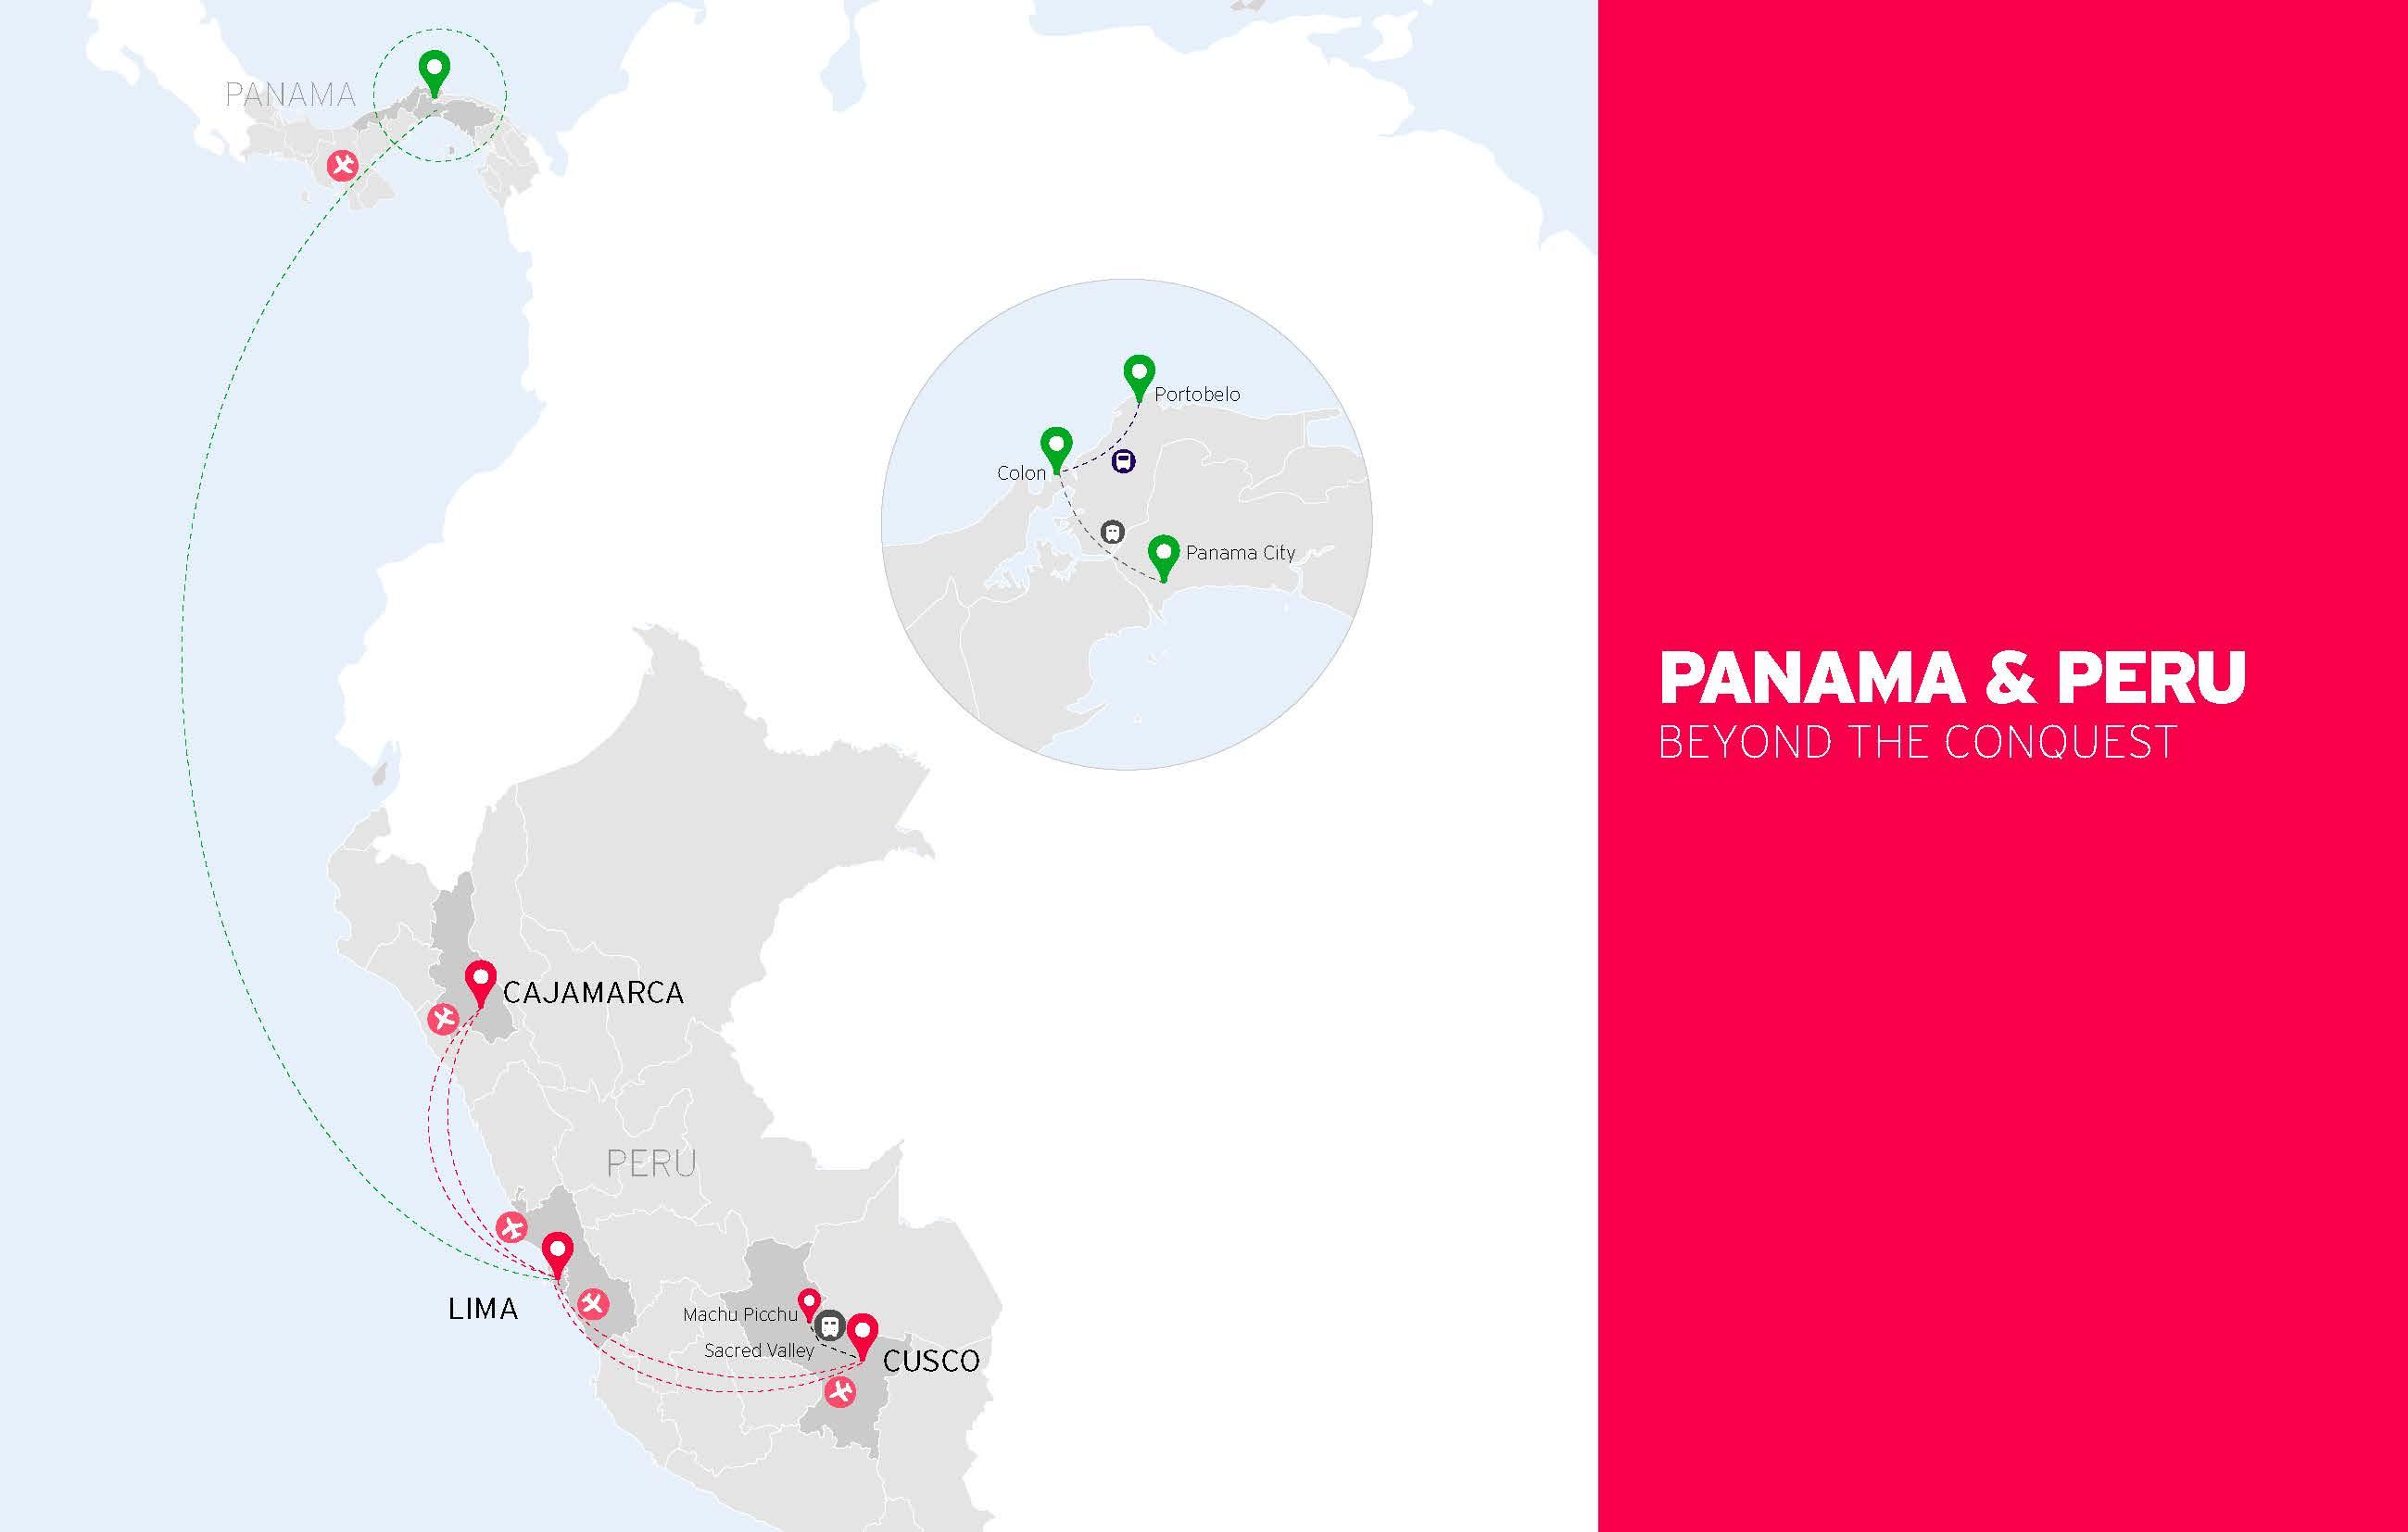 eng-short-panama-peru (20181102)_Page_03.jpg